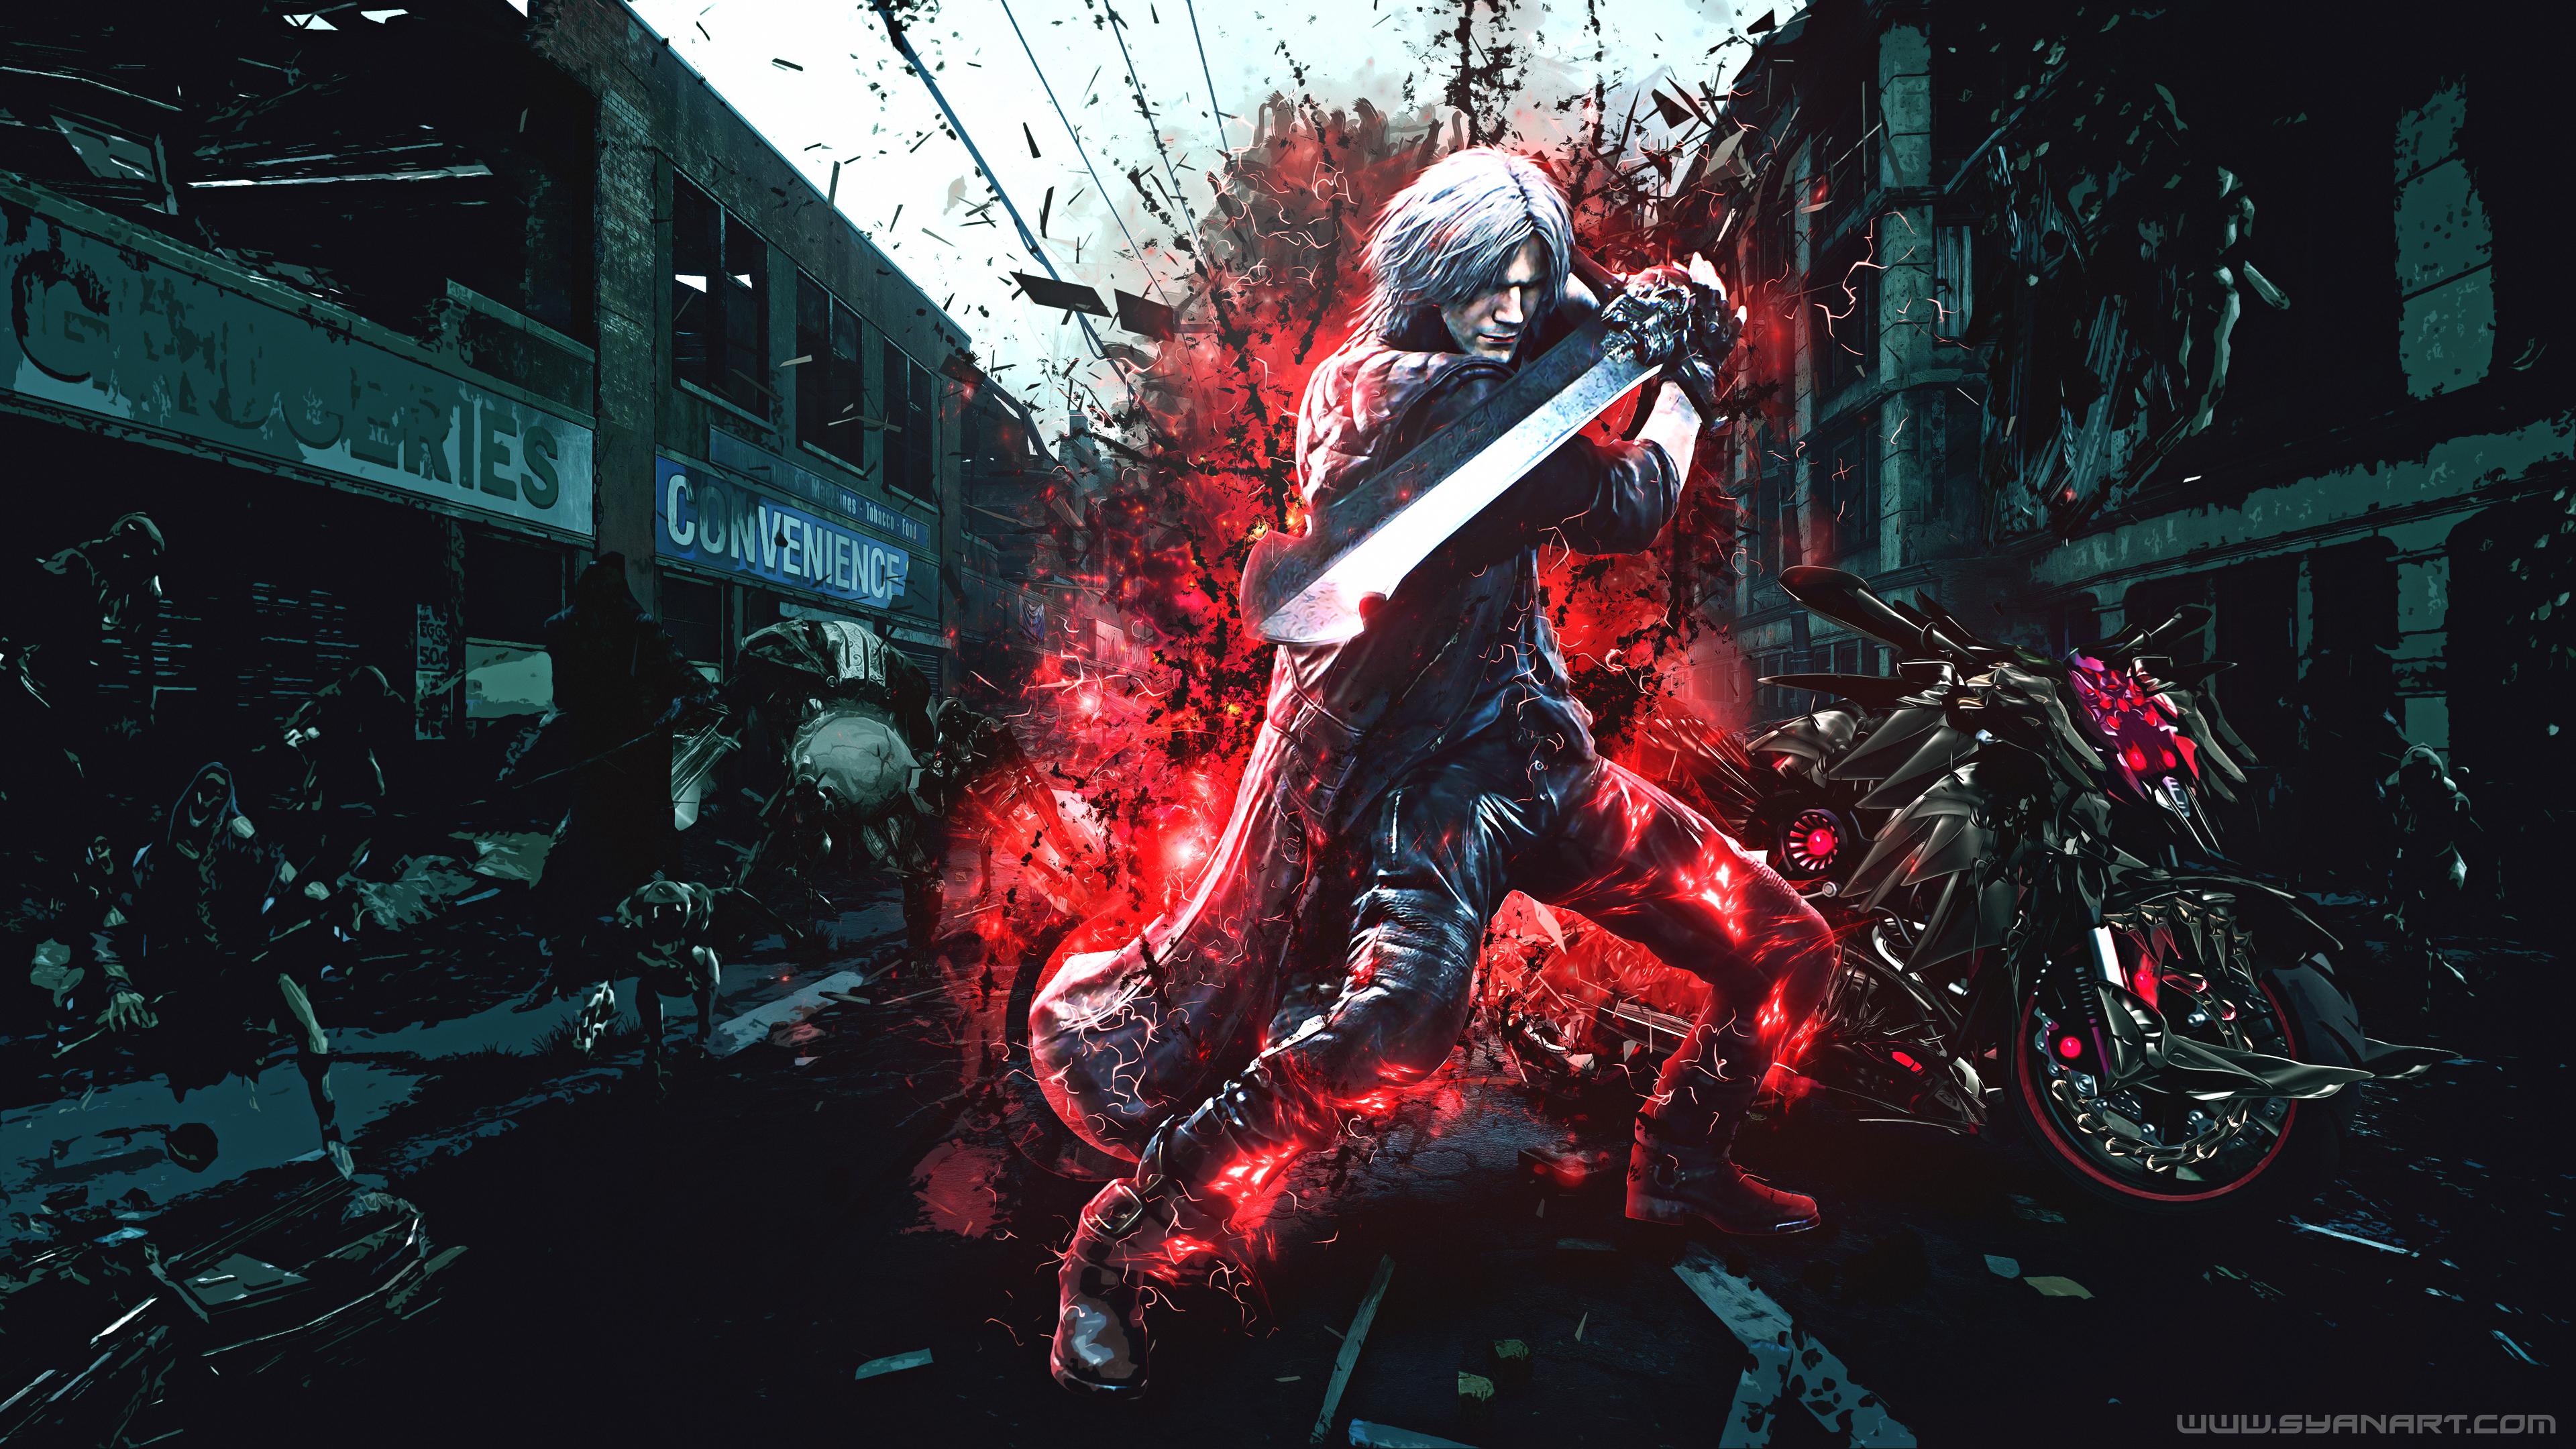 Devil May Cry 5 Dante S Motorbike 4k Wallpaper Syanart Station